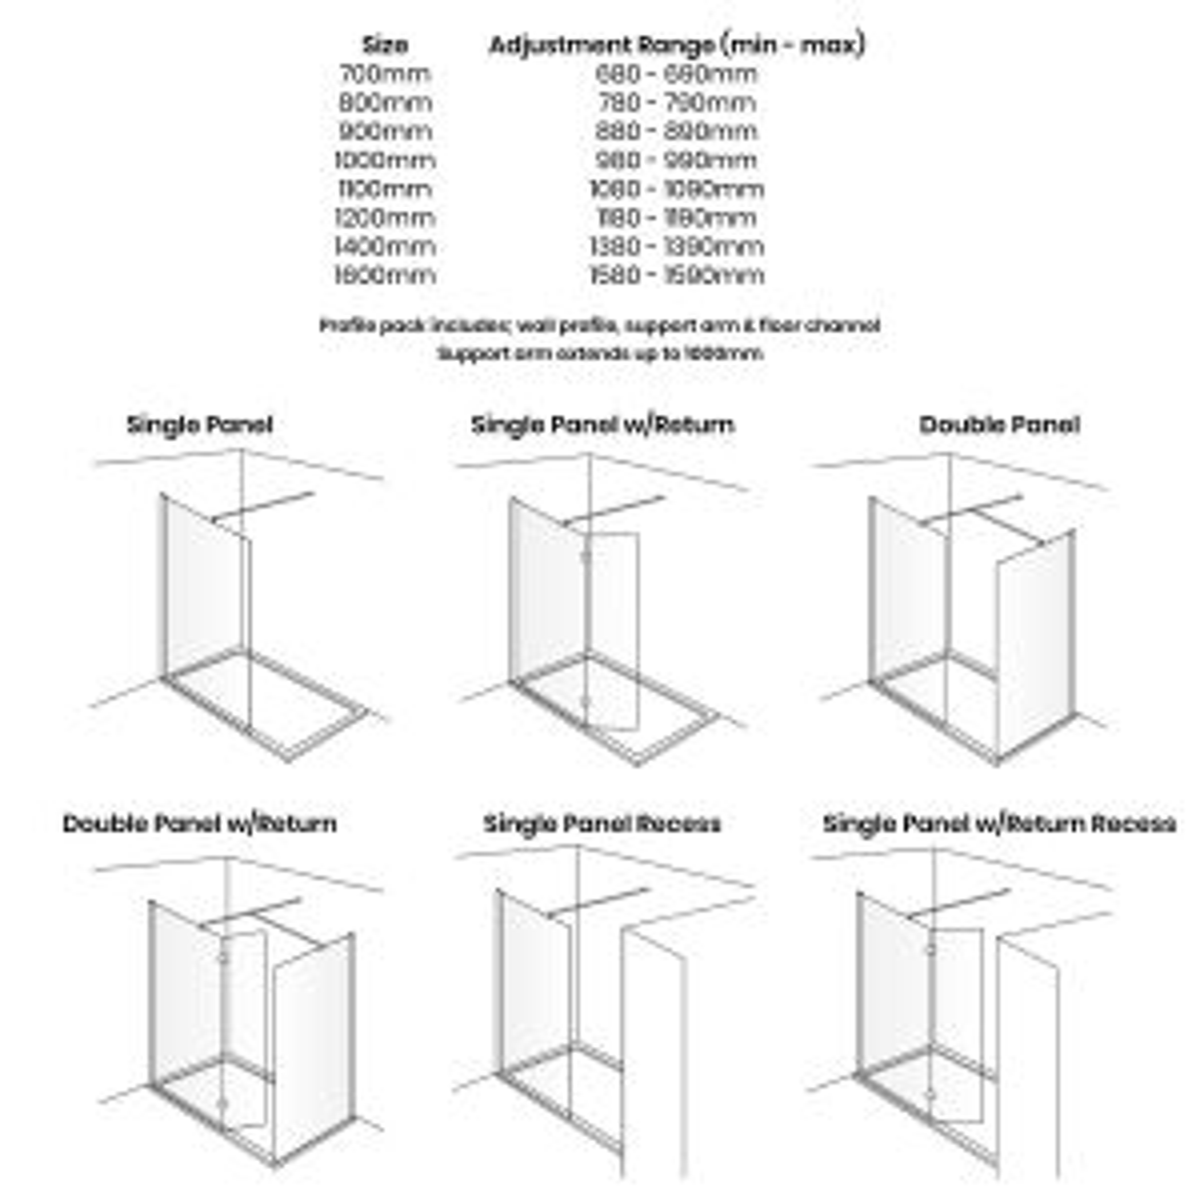 Aquadart Wet Room 10 Copper Wet Room Shower Enclosure with Optional Side Panel Dimensions